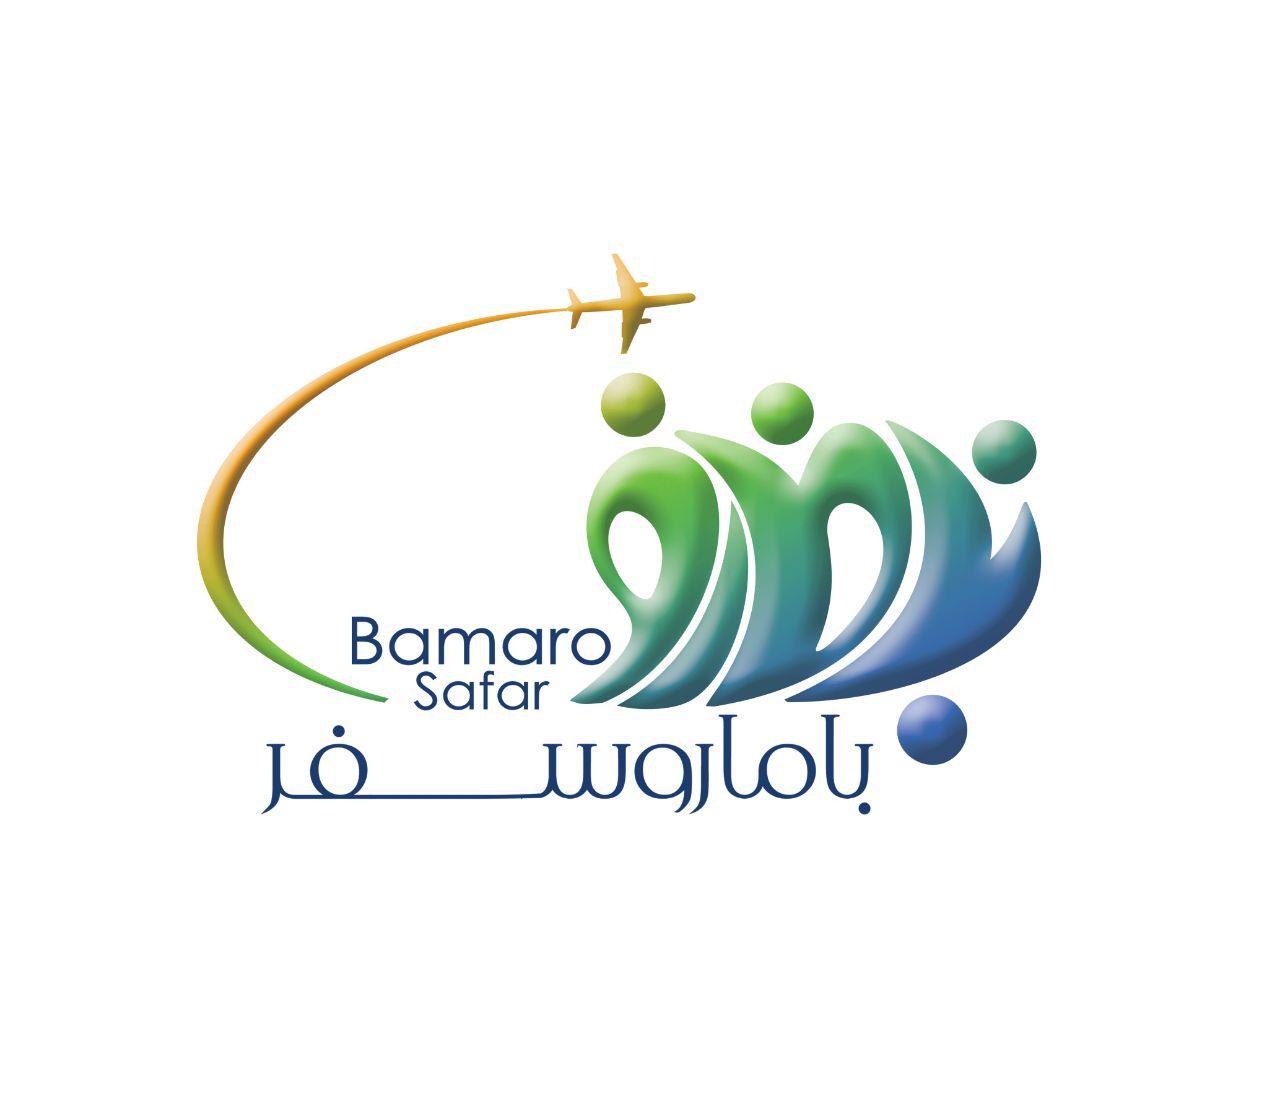 آژانس هواپیمایی باماروسفر